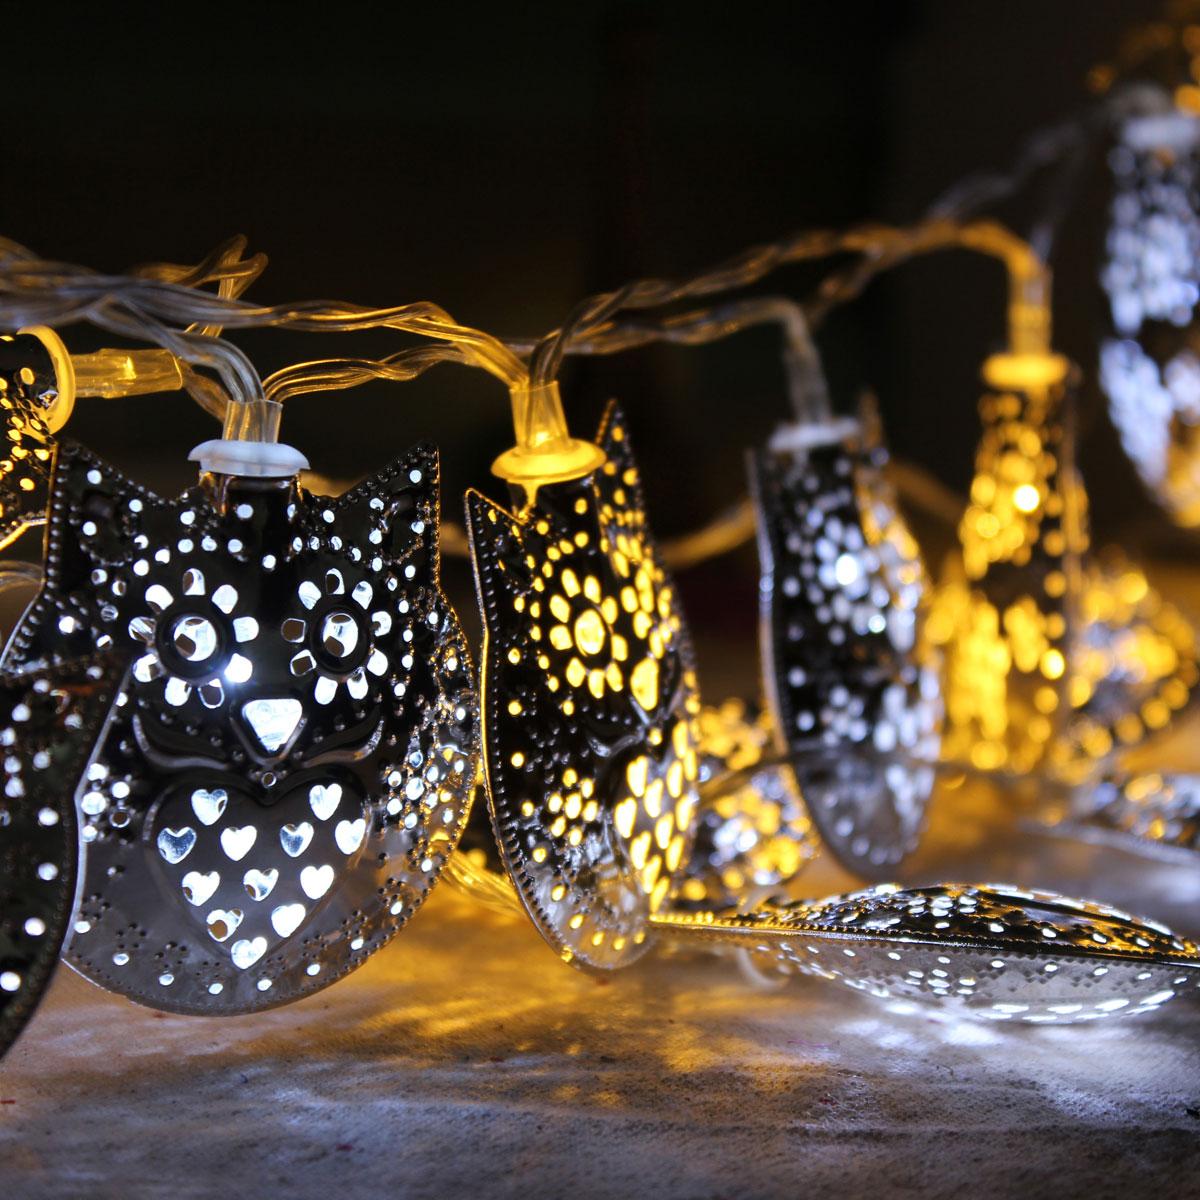 10LED Owl String Fairy Mirror Light Outdoor Garden Home Wedding BBQ Party Lamp eBay